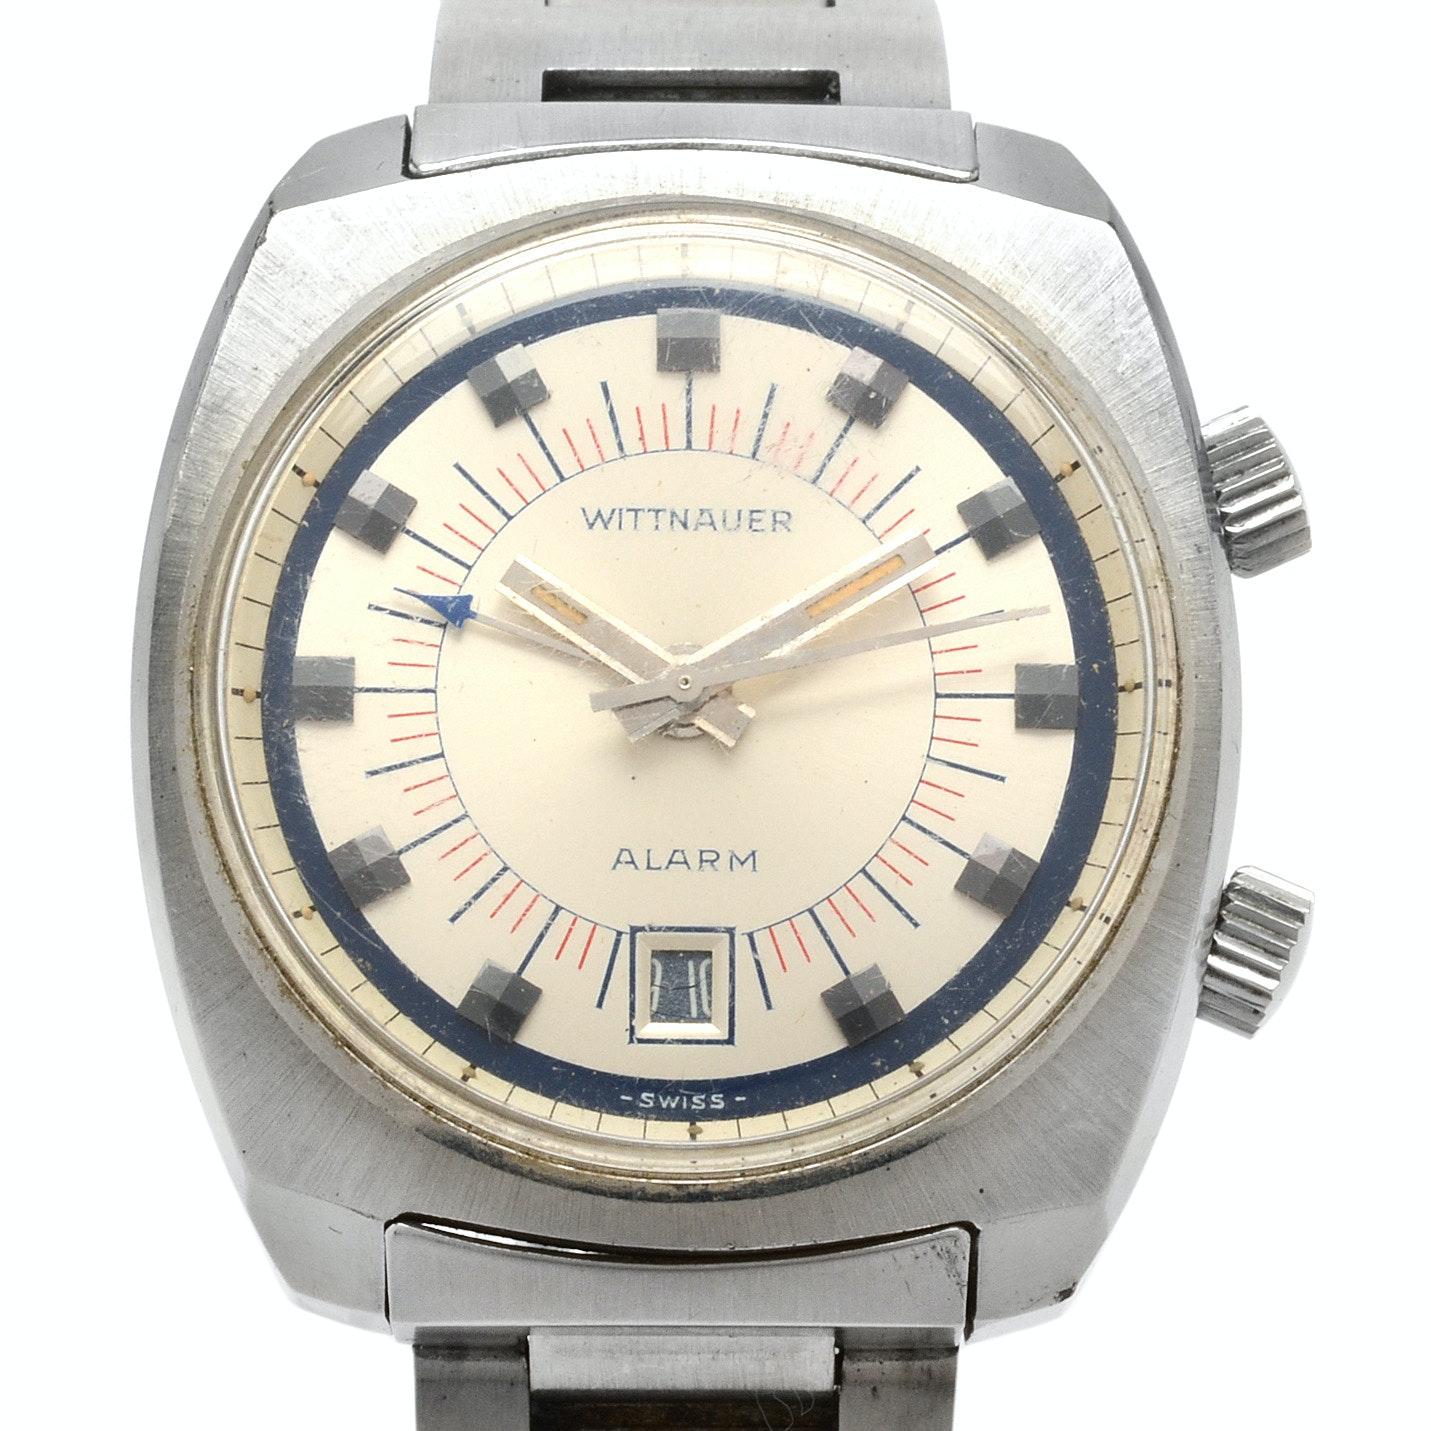 vintage wittnauer alarm date steel manual winding wristwatch ebth rh ebth com Old Wittnauer Watch Values Old Wittnauer Watch Values